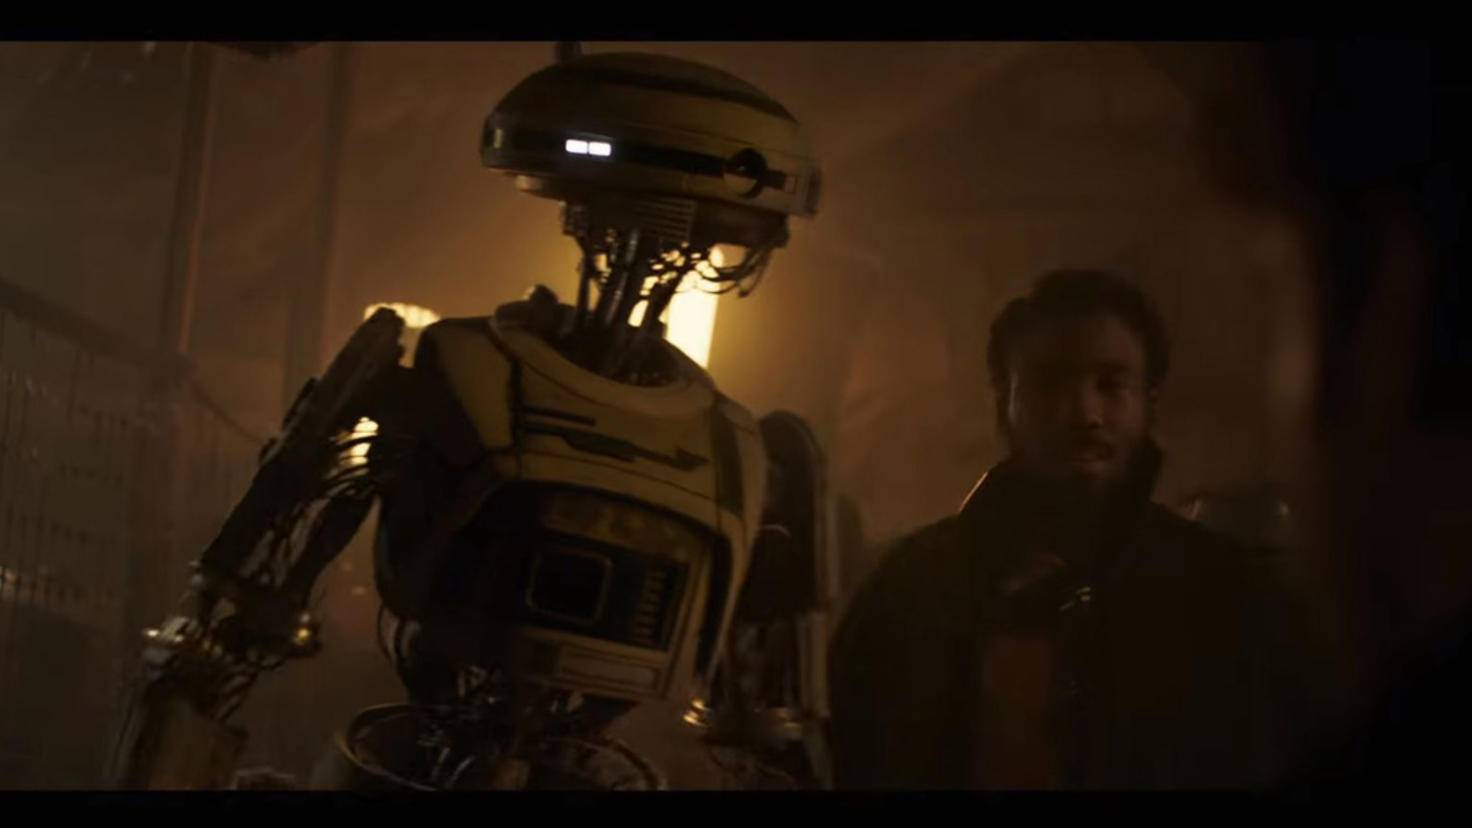 Solo_Trailer_Droidin_YouTube_Star Wars